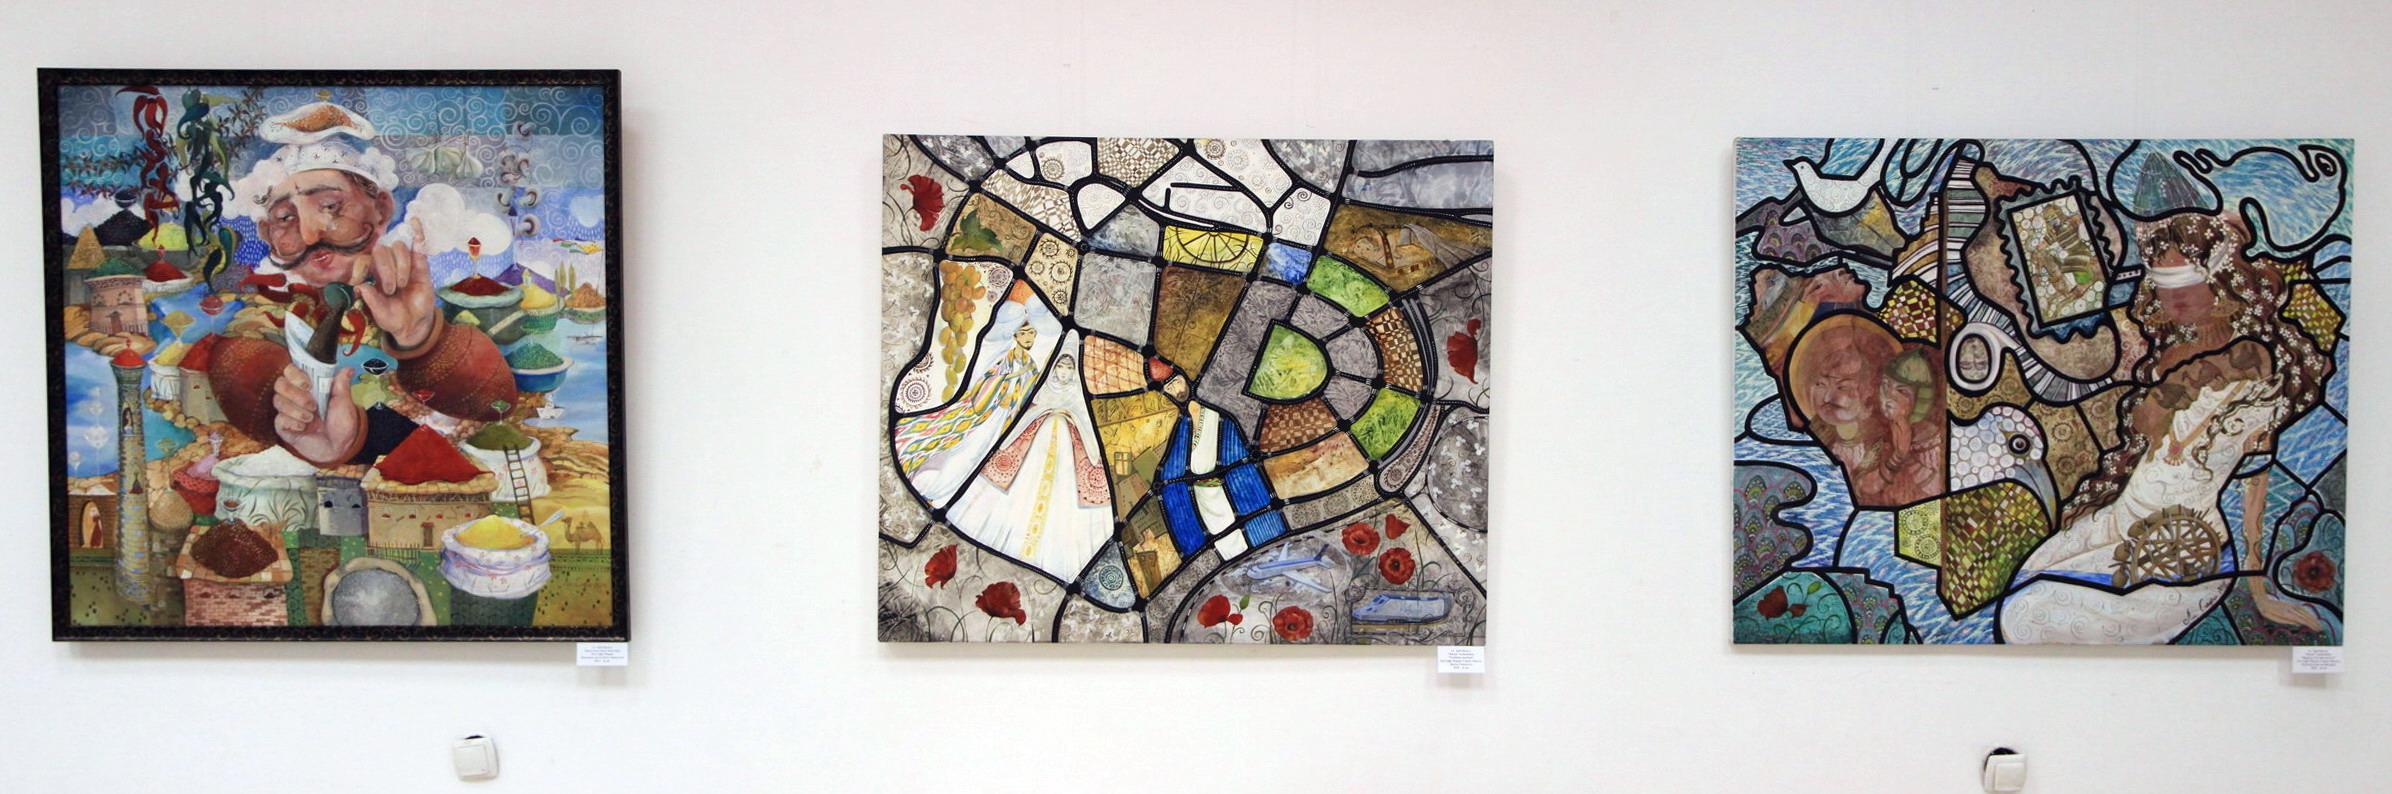 Экспозиция картин Марии ЛИ-Сафи